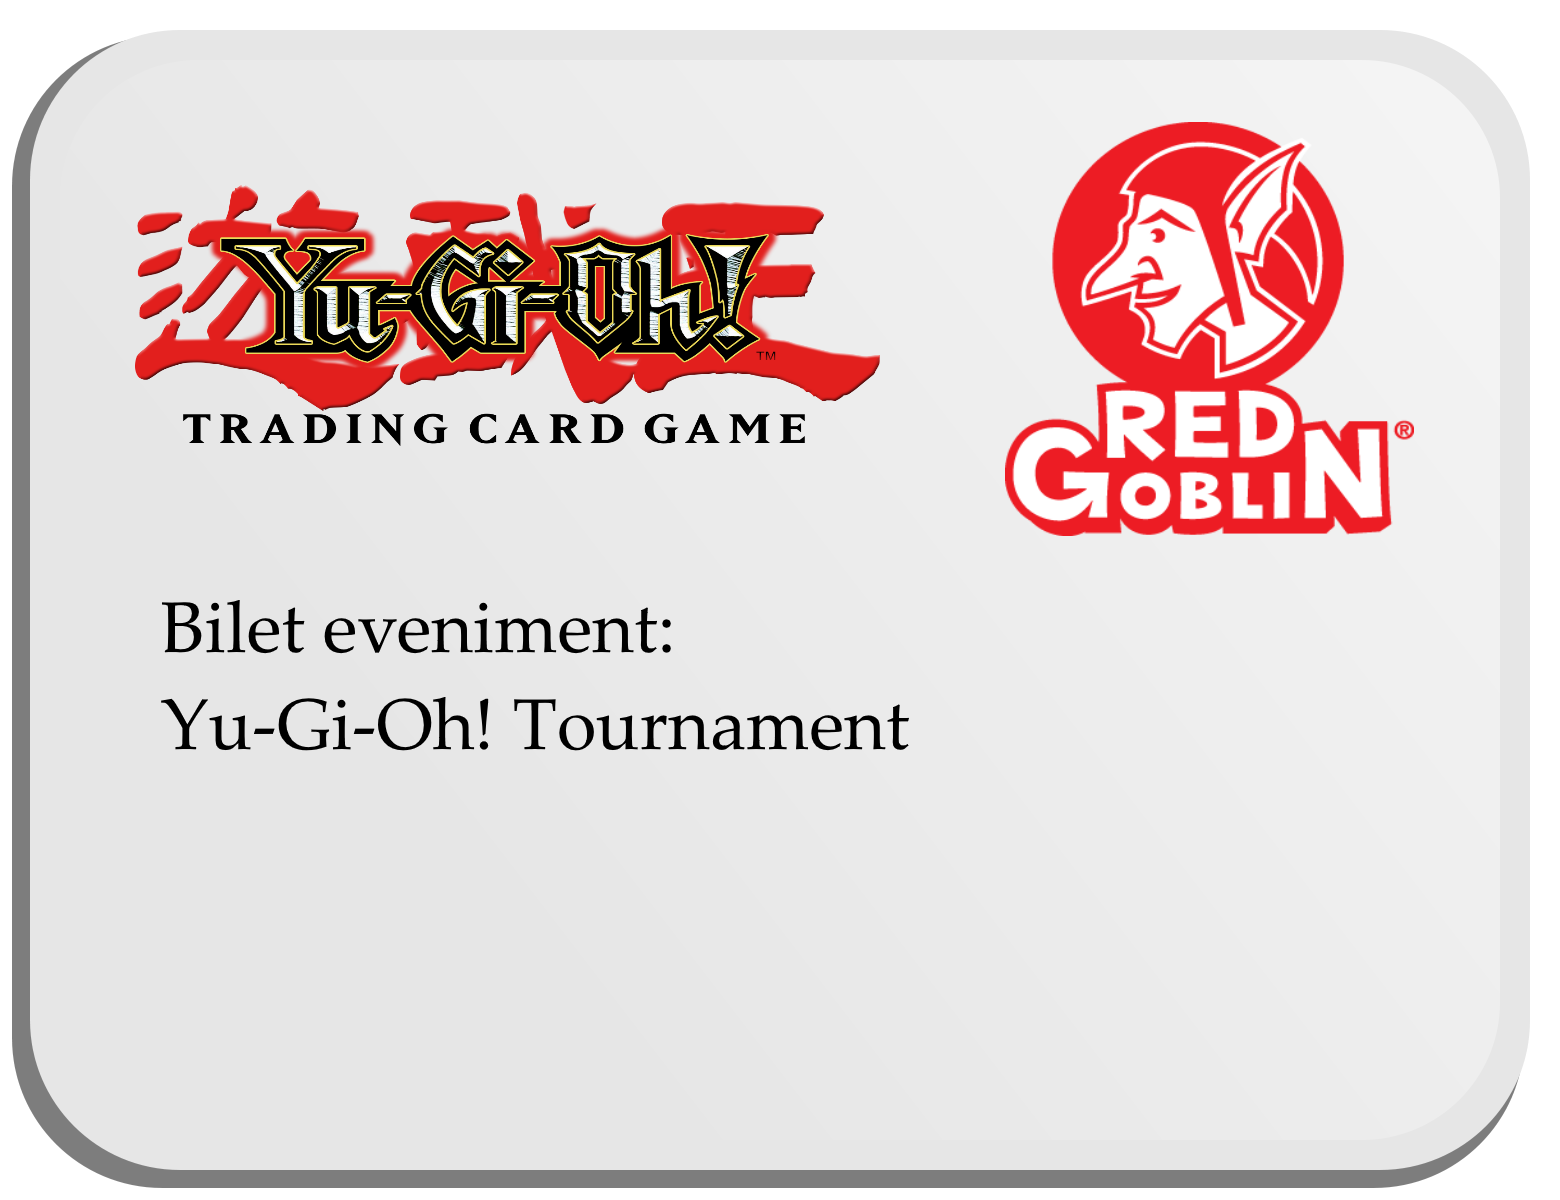 Bilet Eveniment Yu-Gi-Oh!